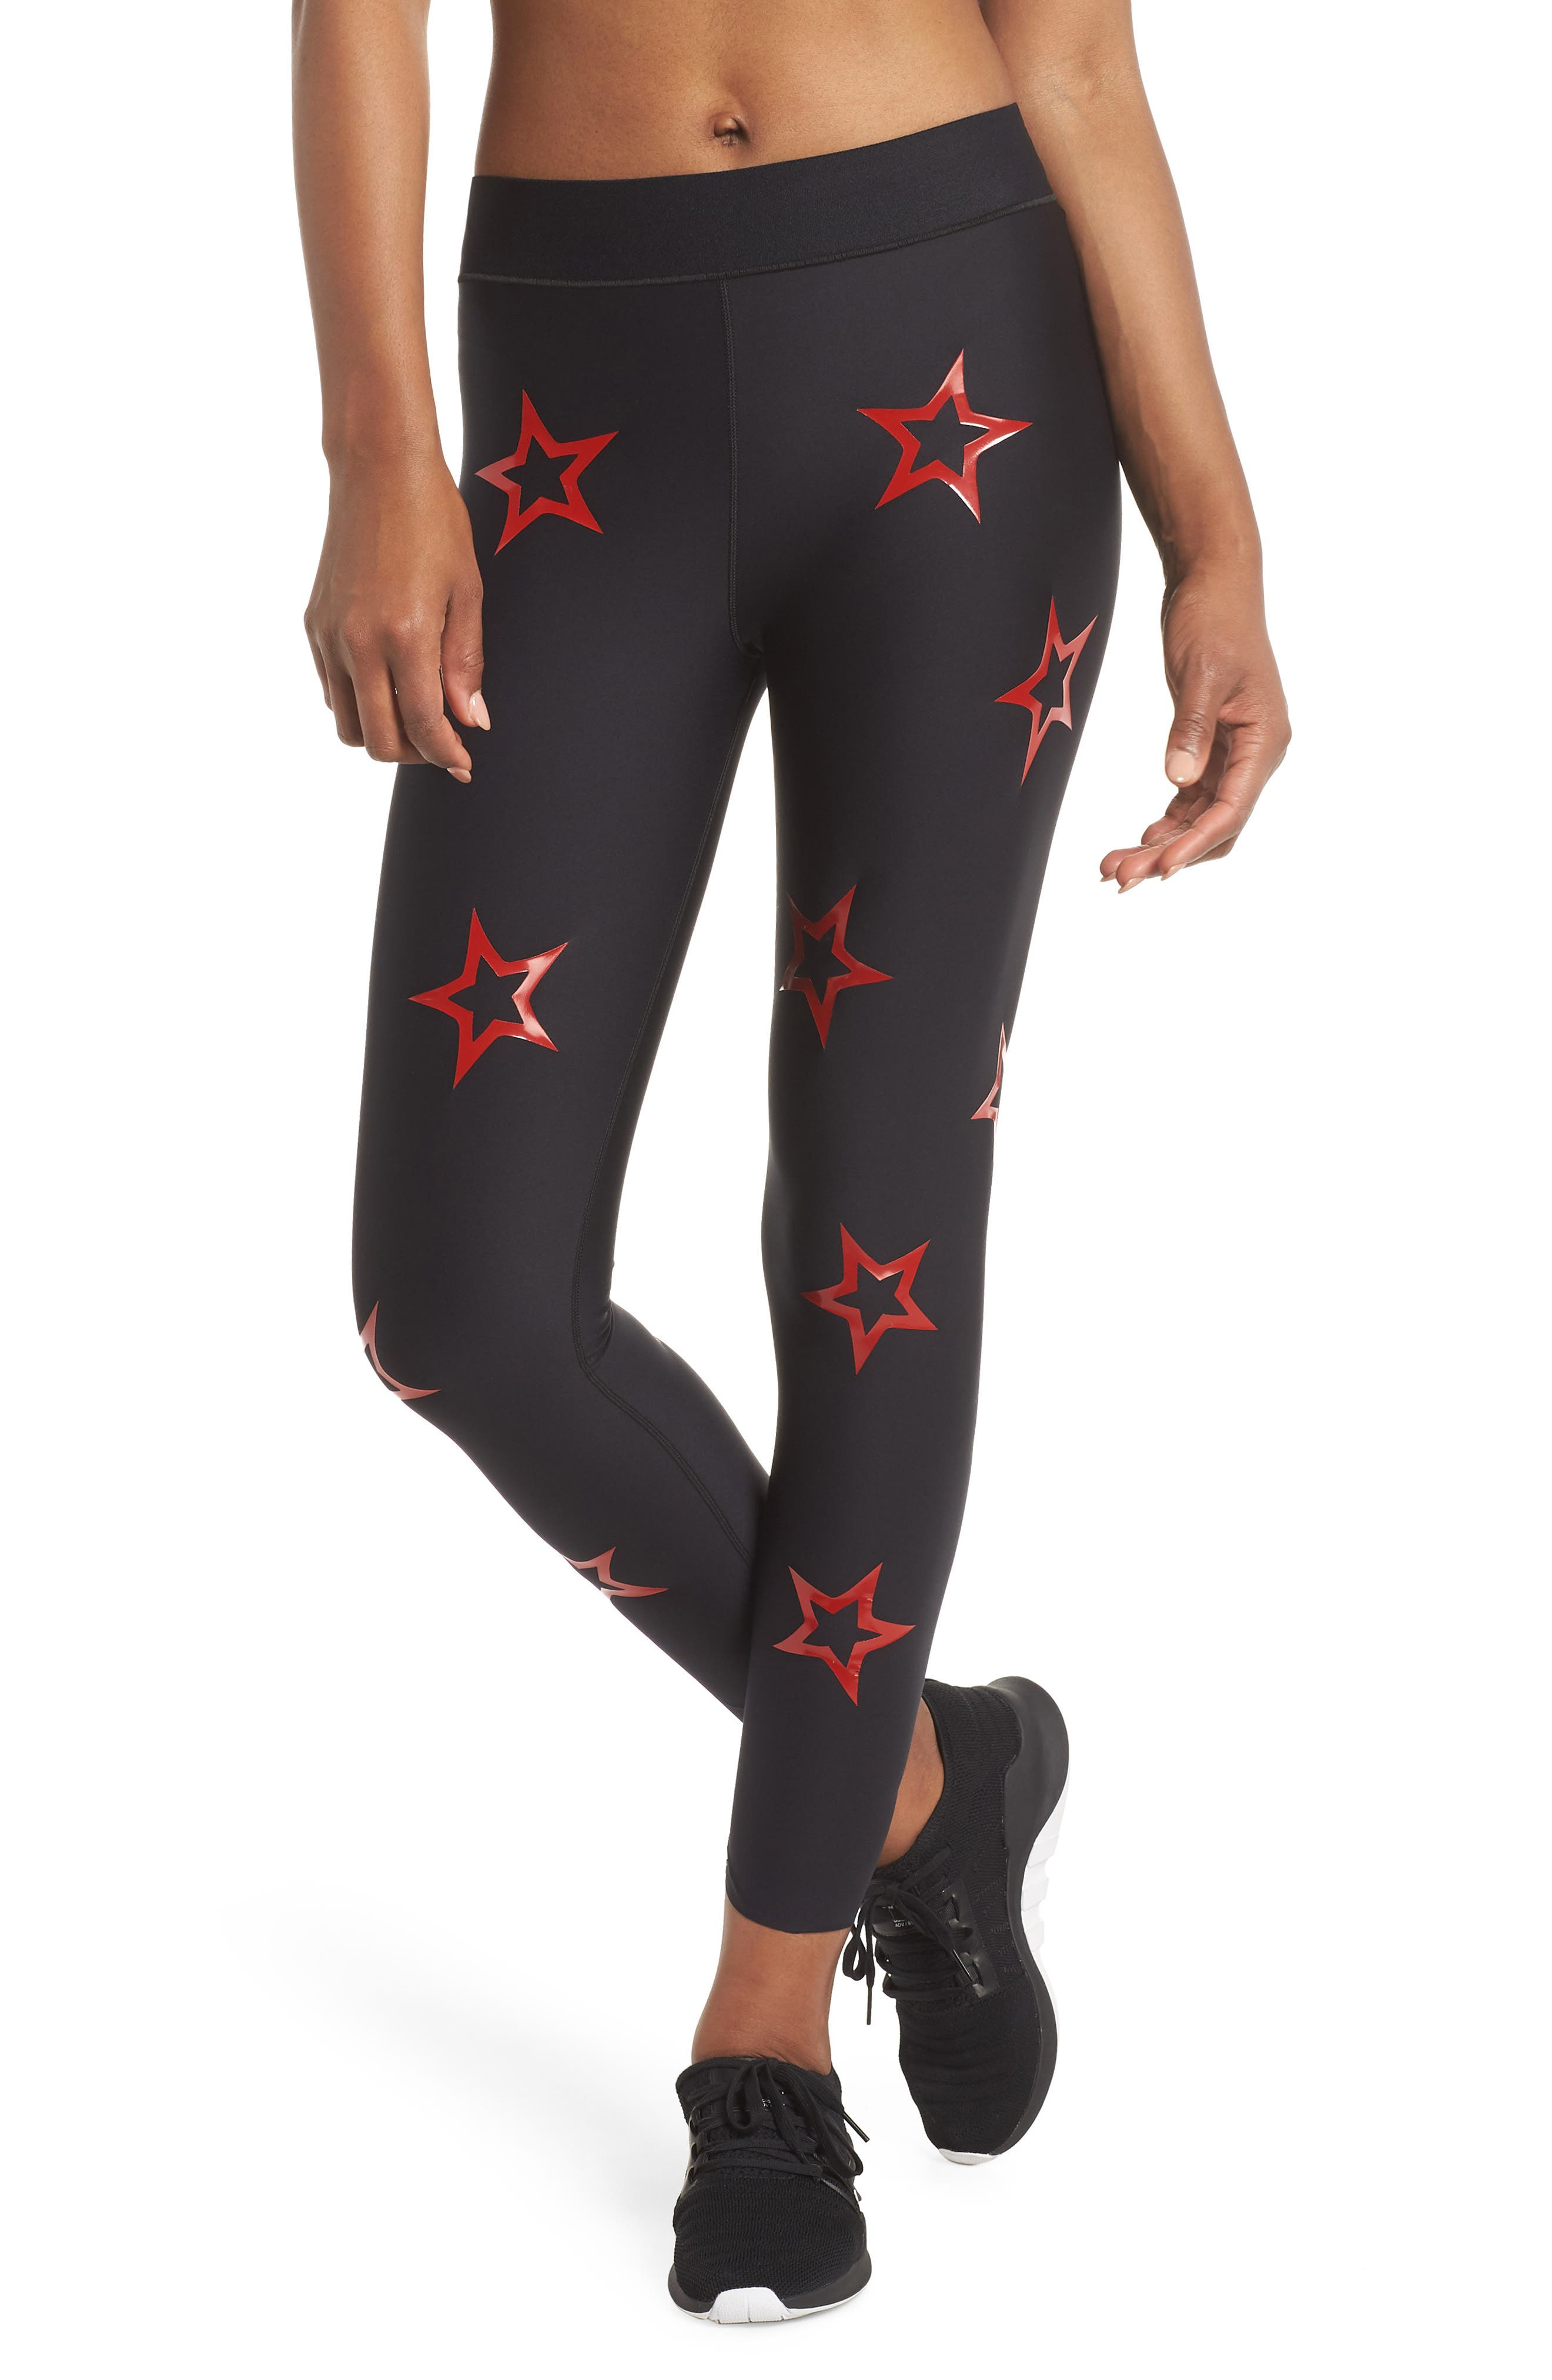 Ultra Dropout Knockout Leggings,                         Main,                         color, NERO/ PATENT ROUGE